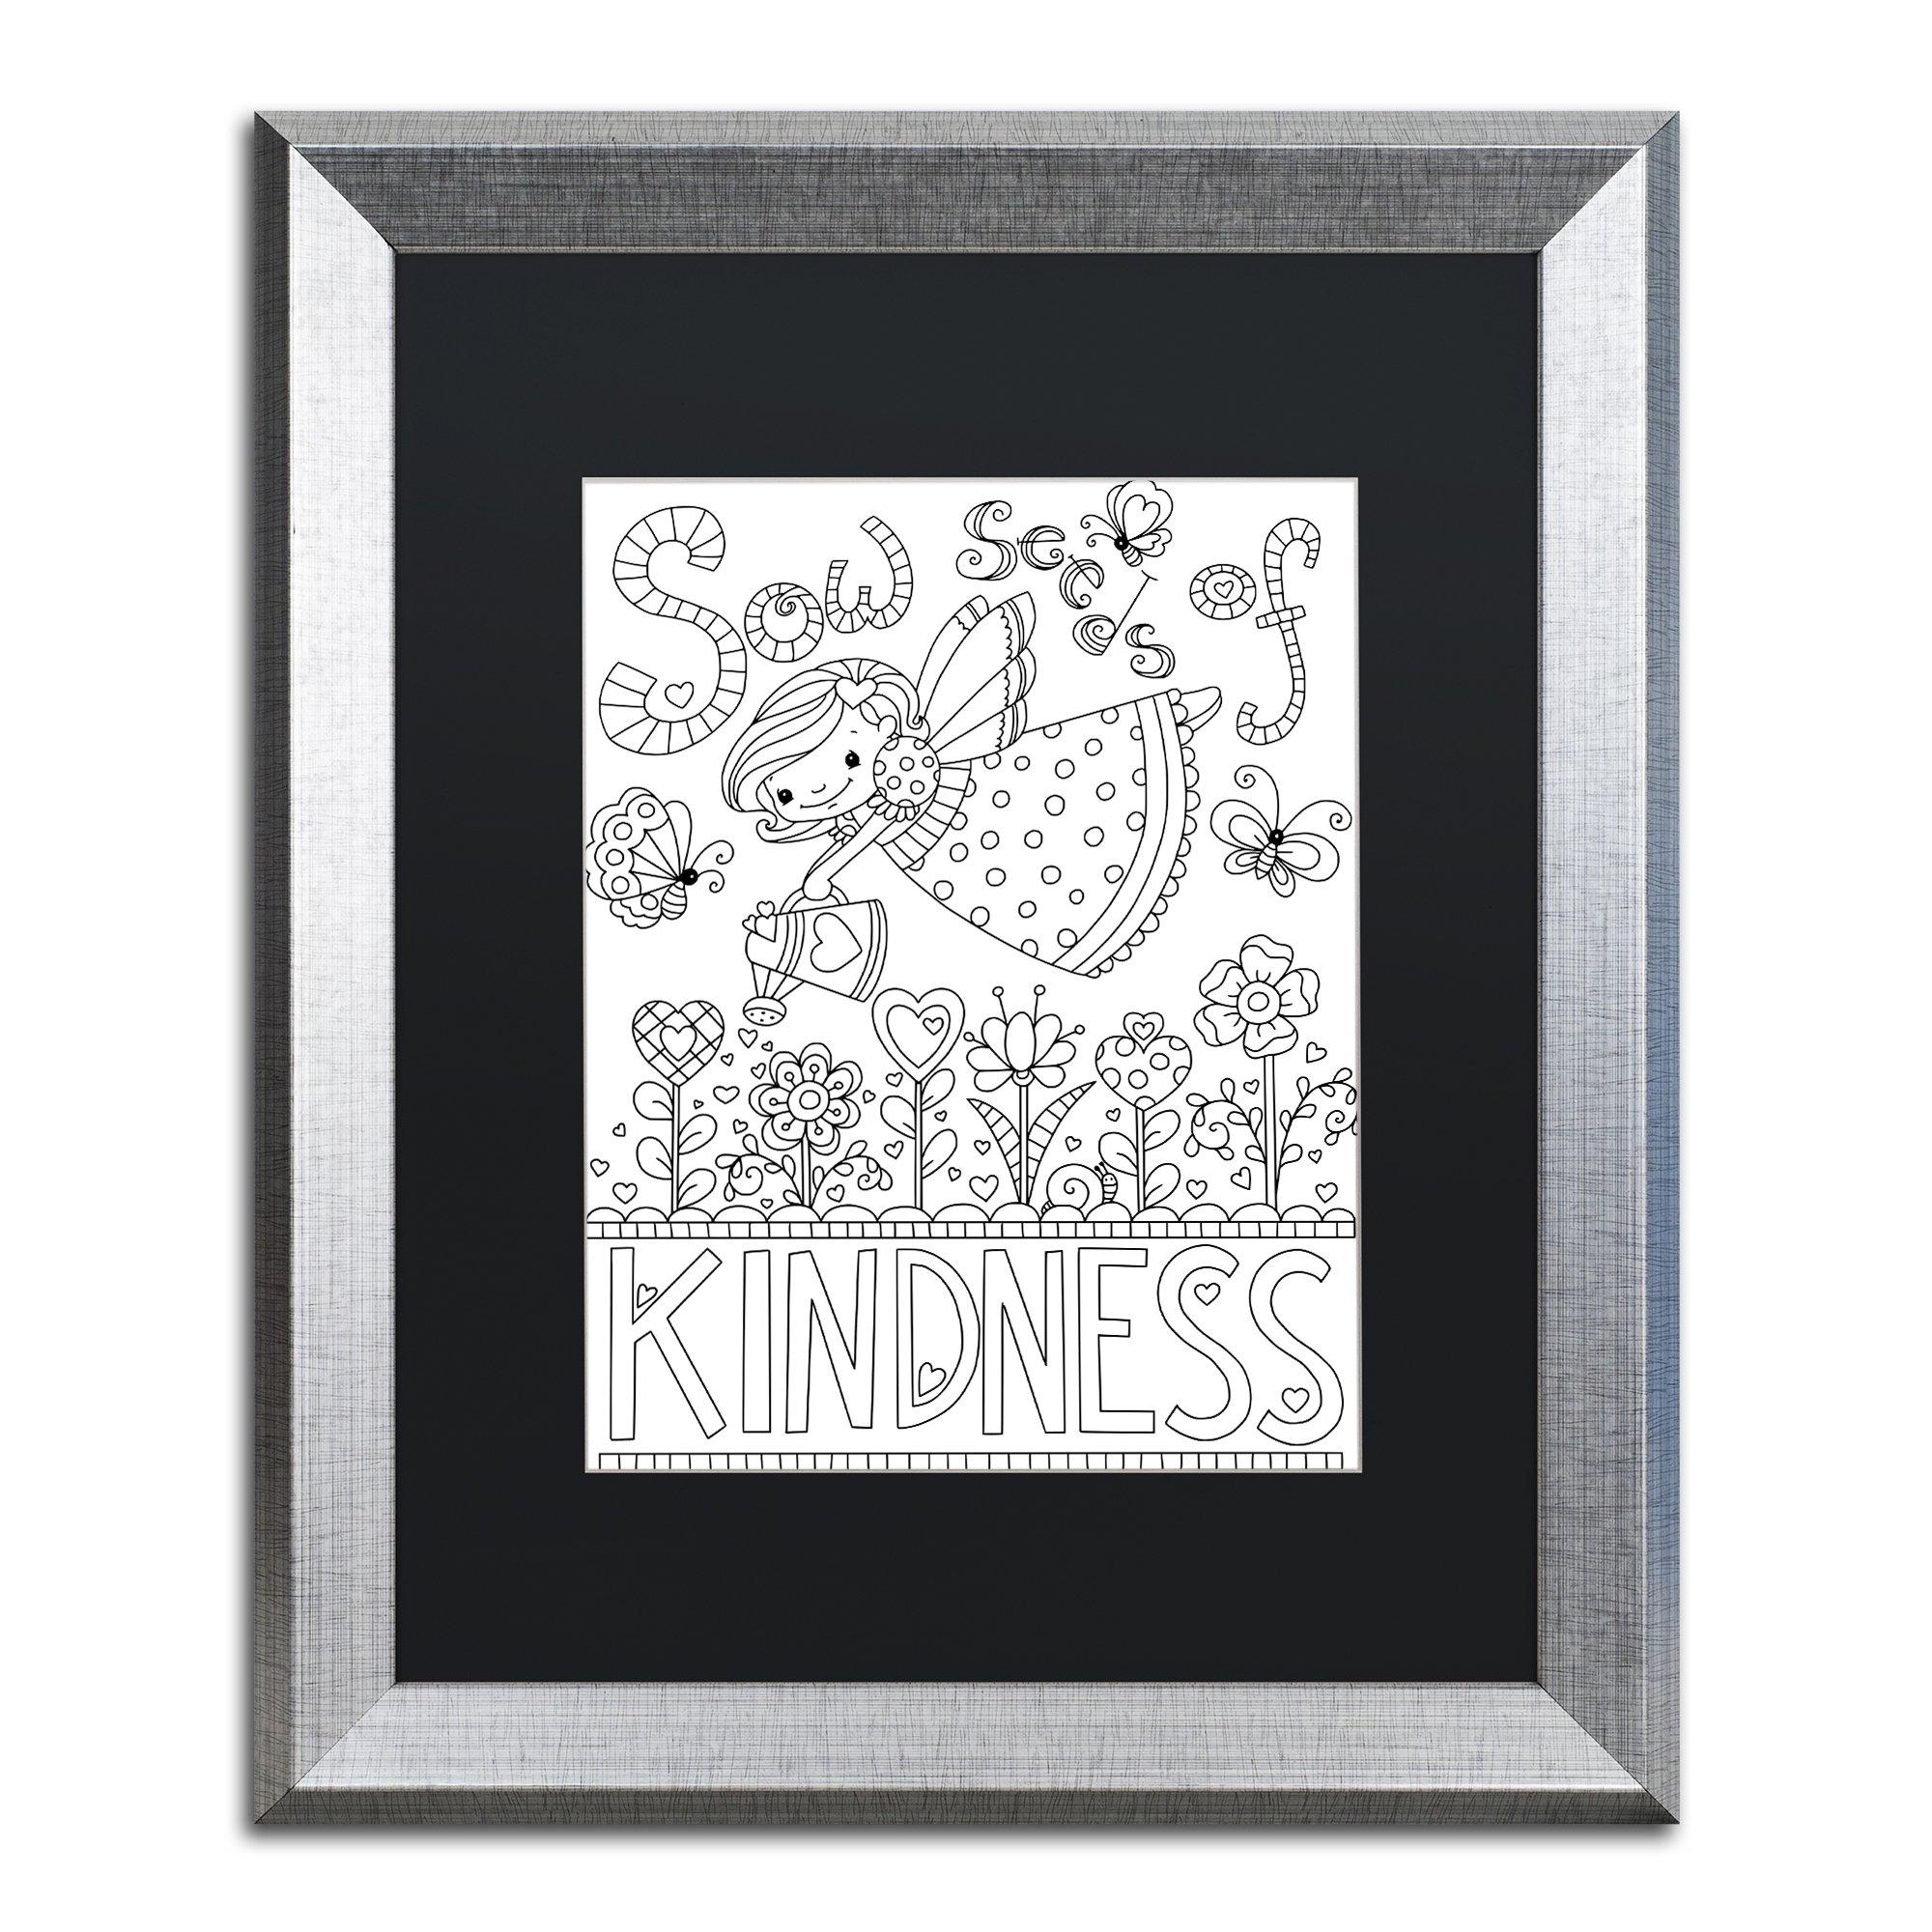 Sow Seeds by Jennifer Nilsson, Black Matte, Silver Frame 16x20-Inch by Trademark Fine Art